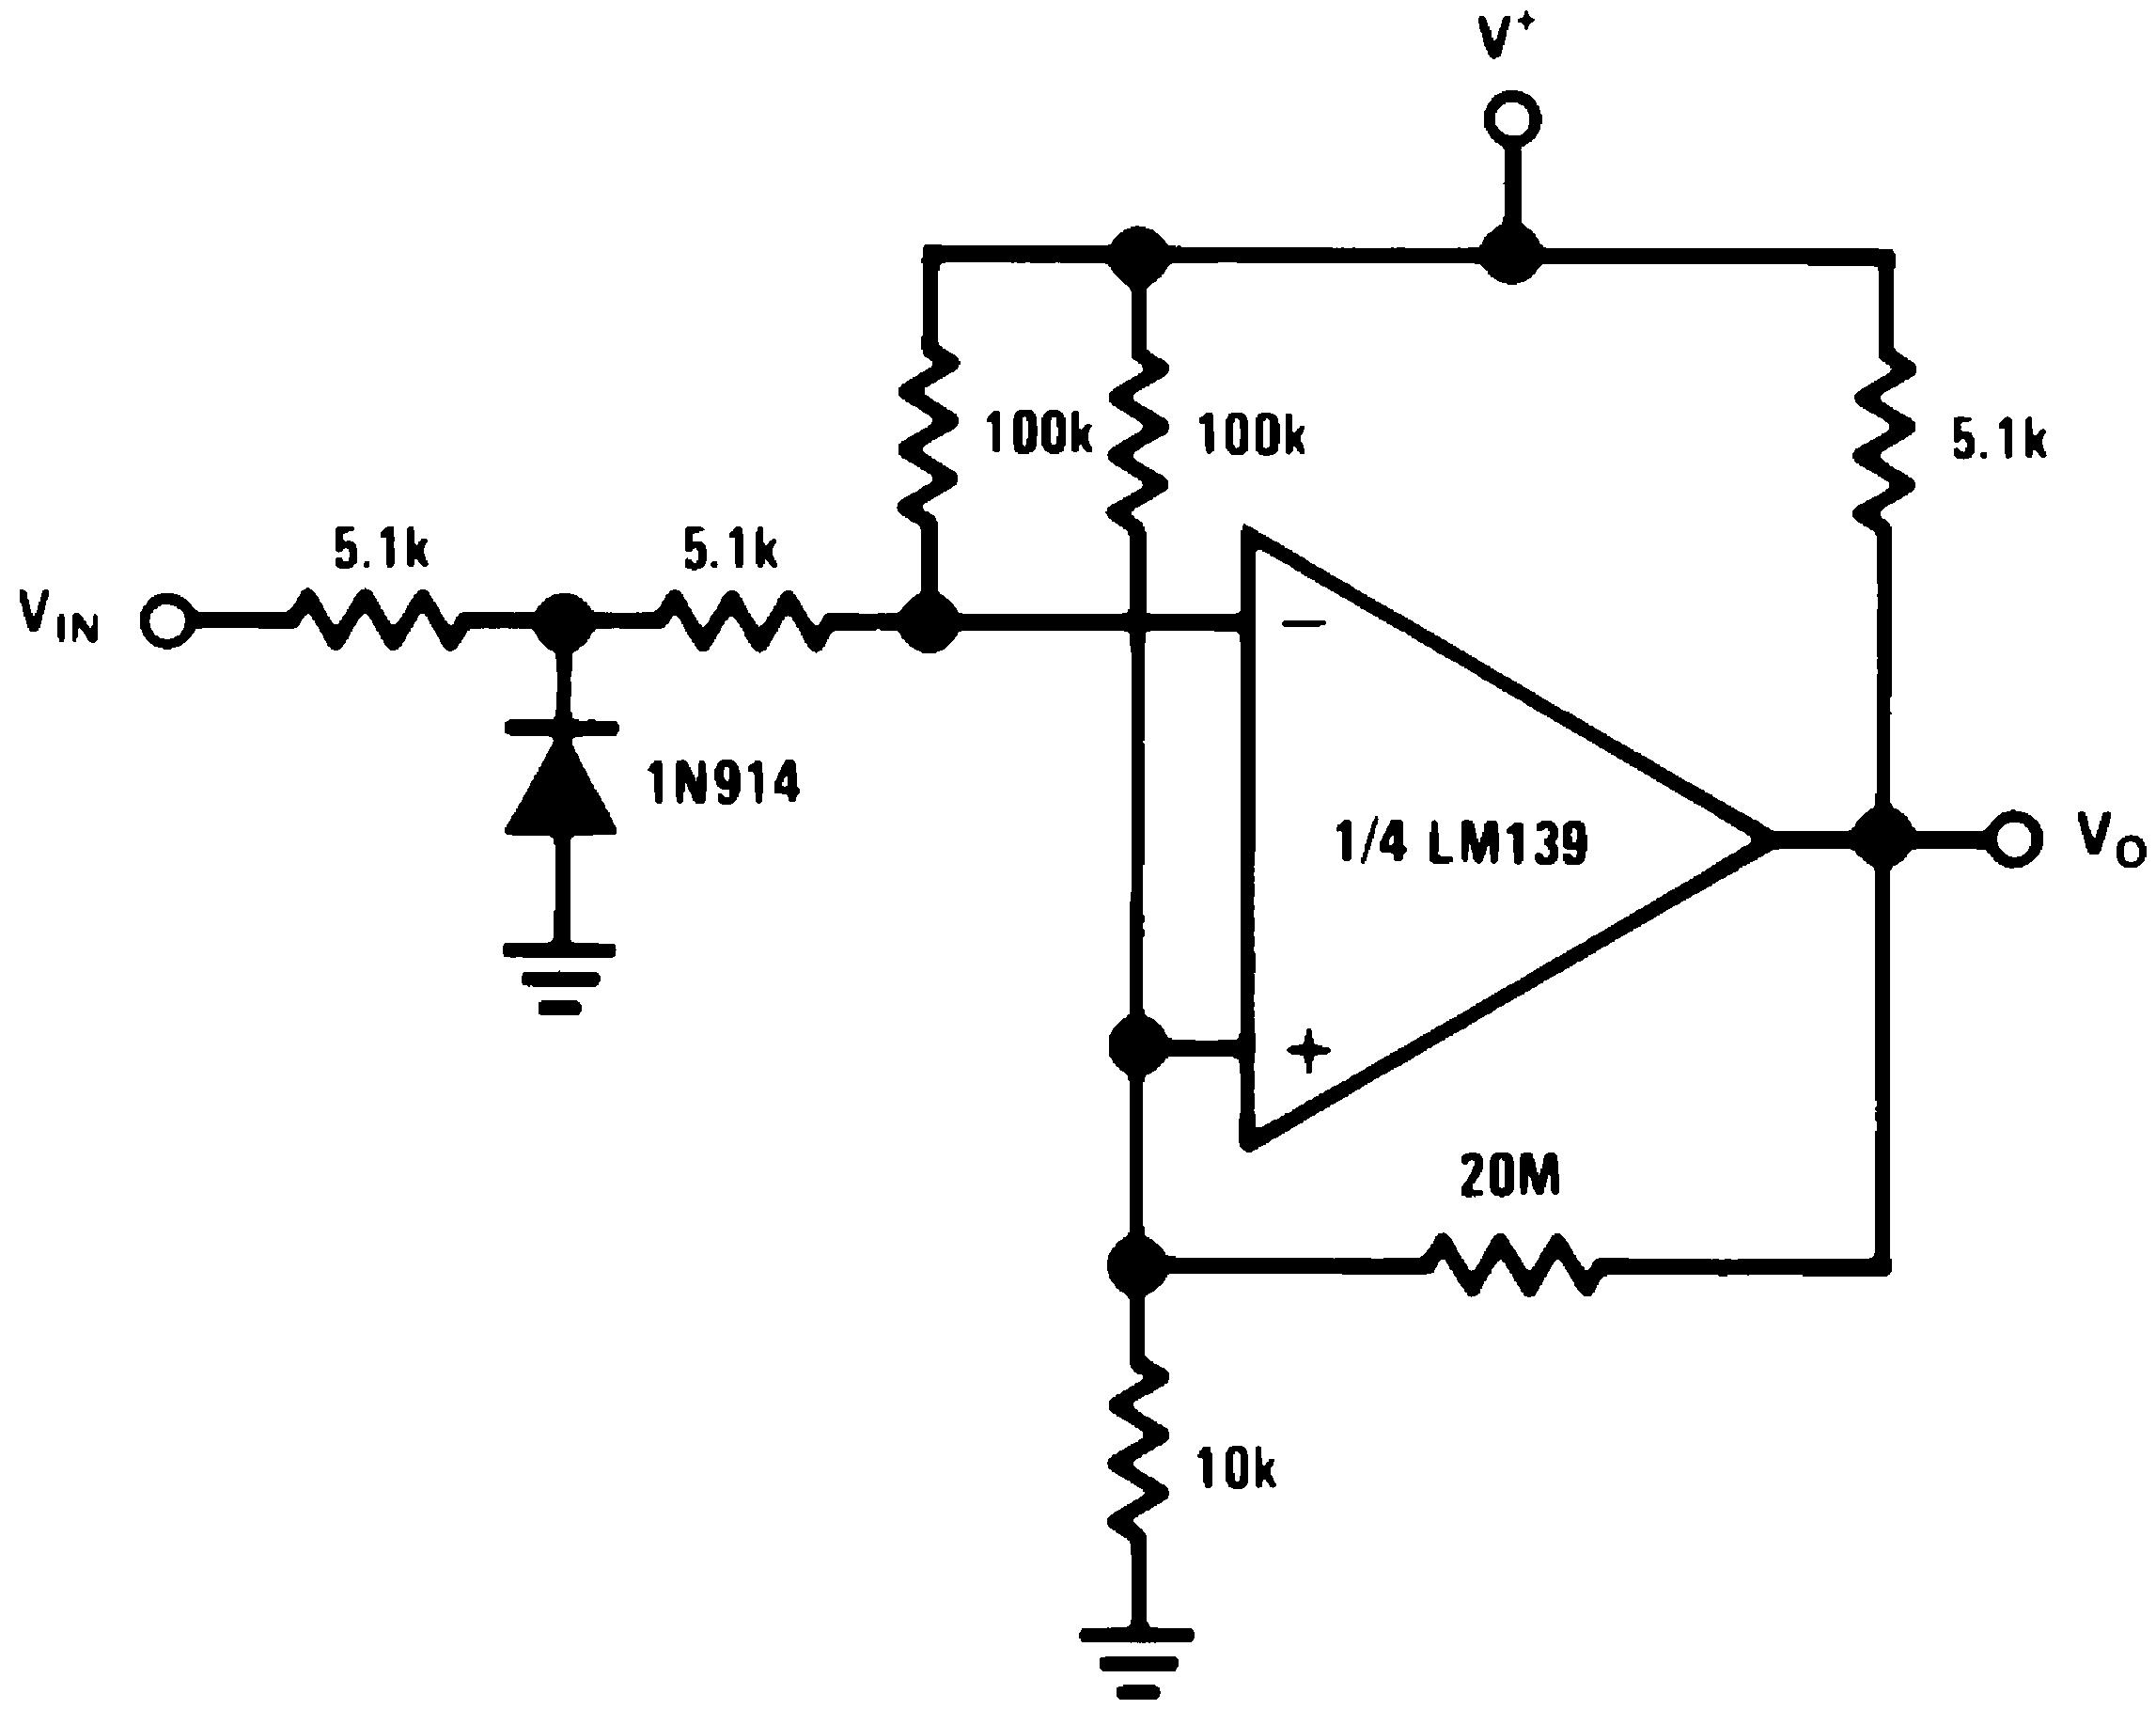 Lm239 N Cell Phone Detector Circuit Diagram On Zero Crossing Single Power Supply V 15 Vdc